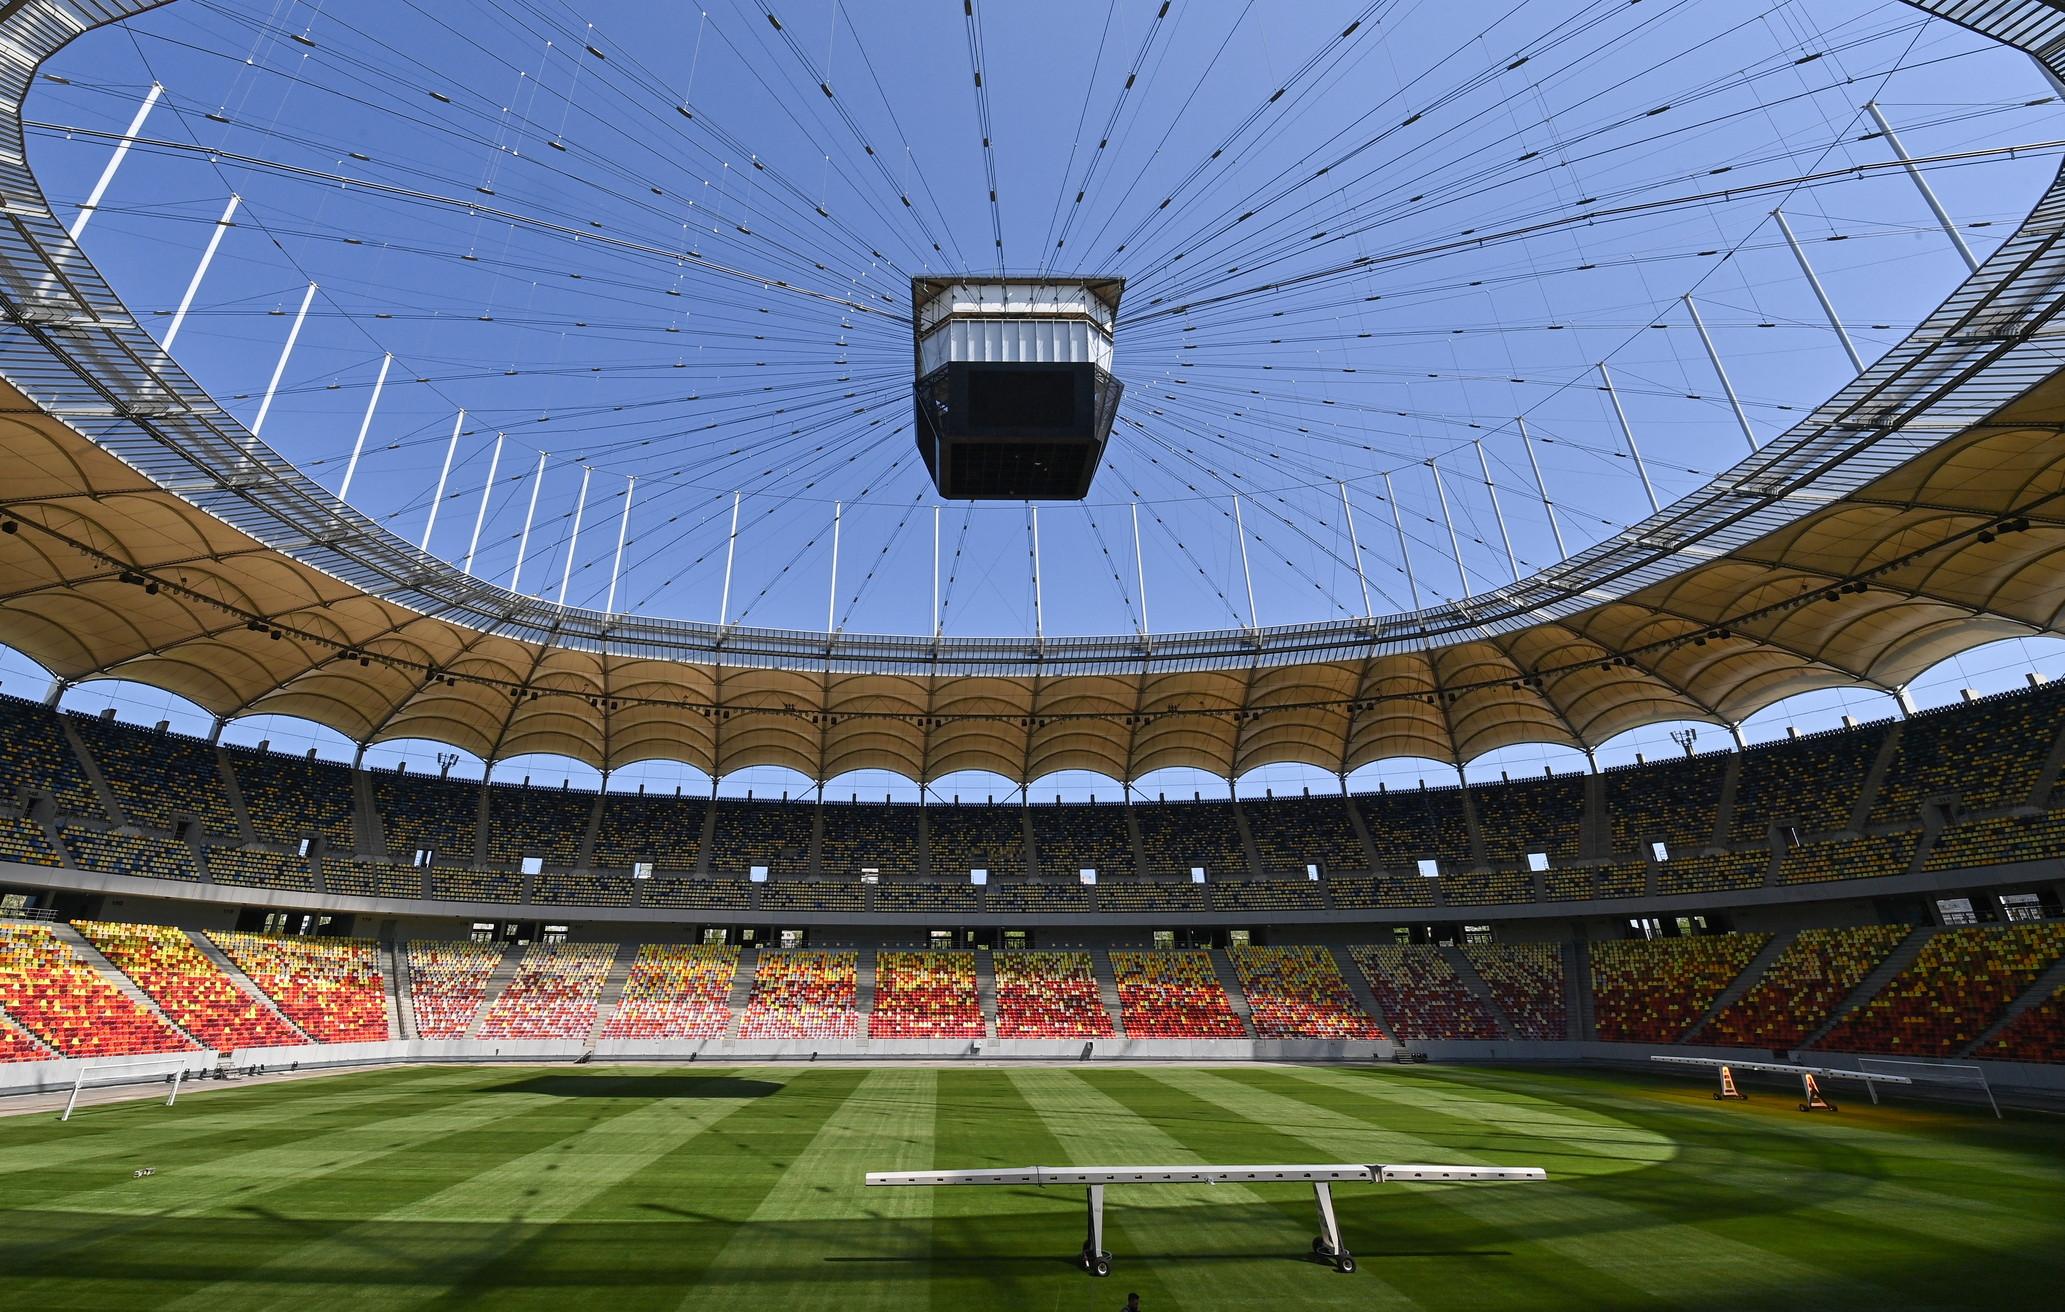 Bucarest - National Arena Bucharest